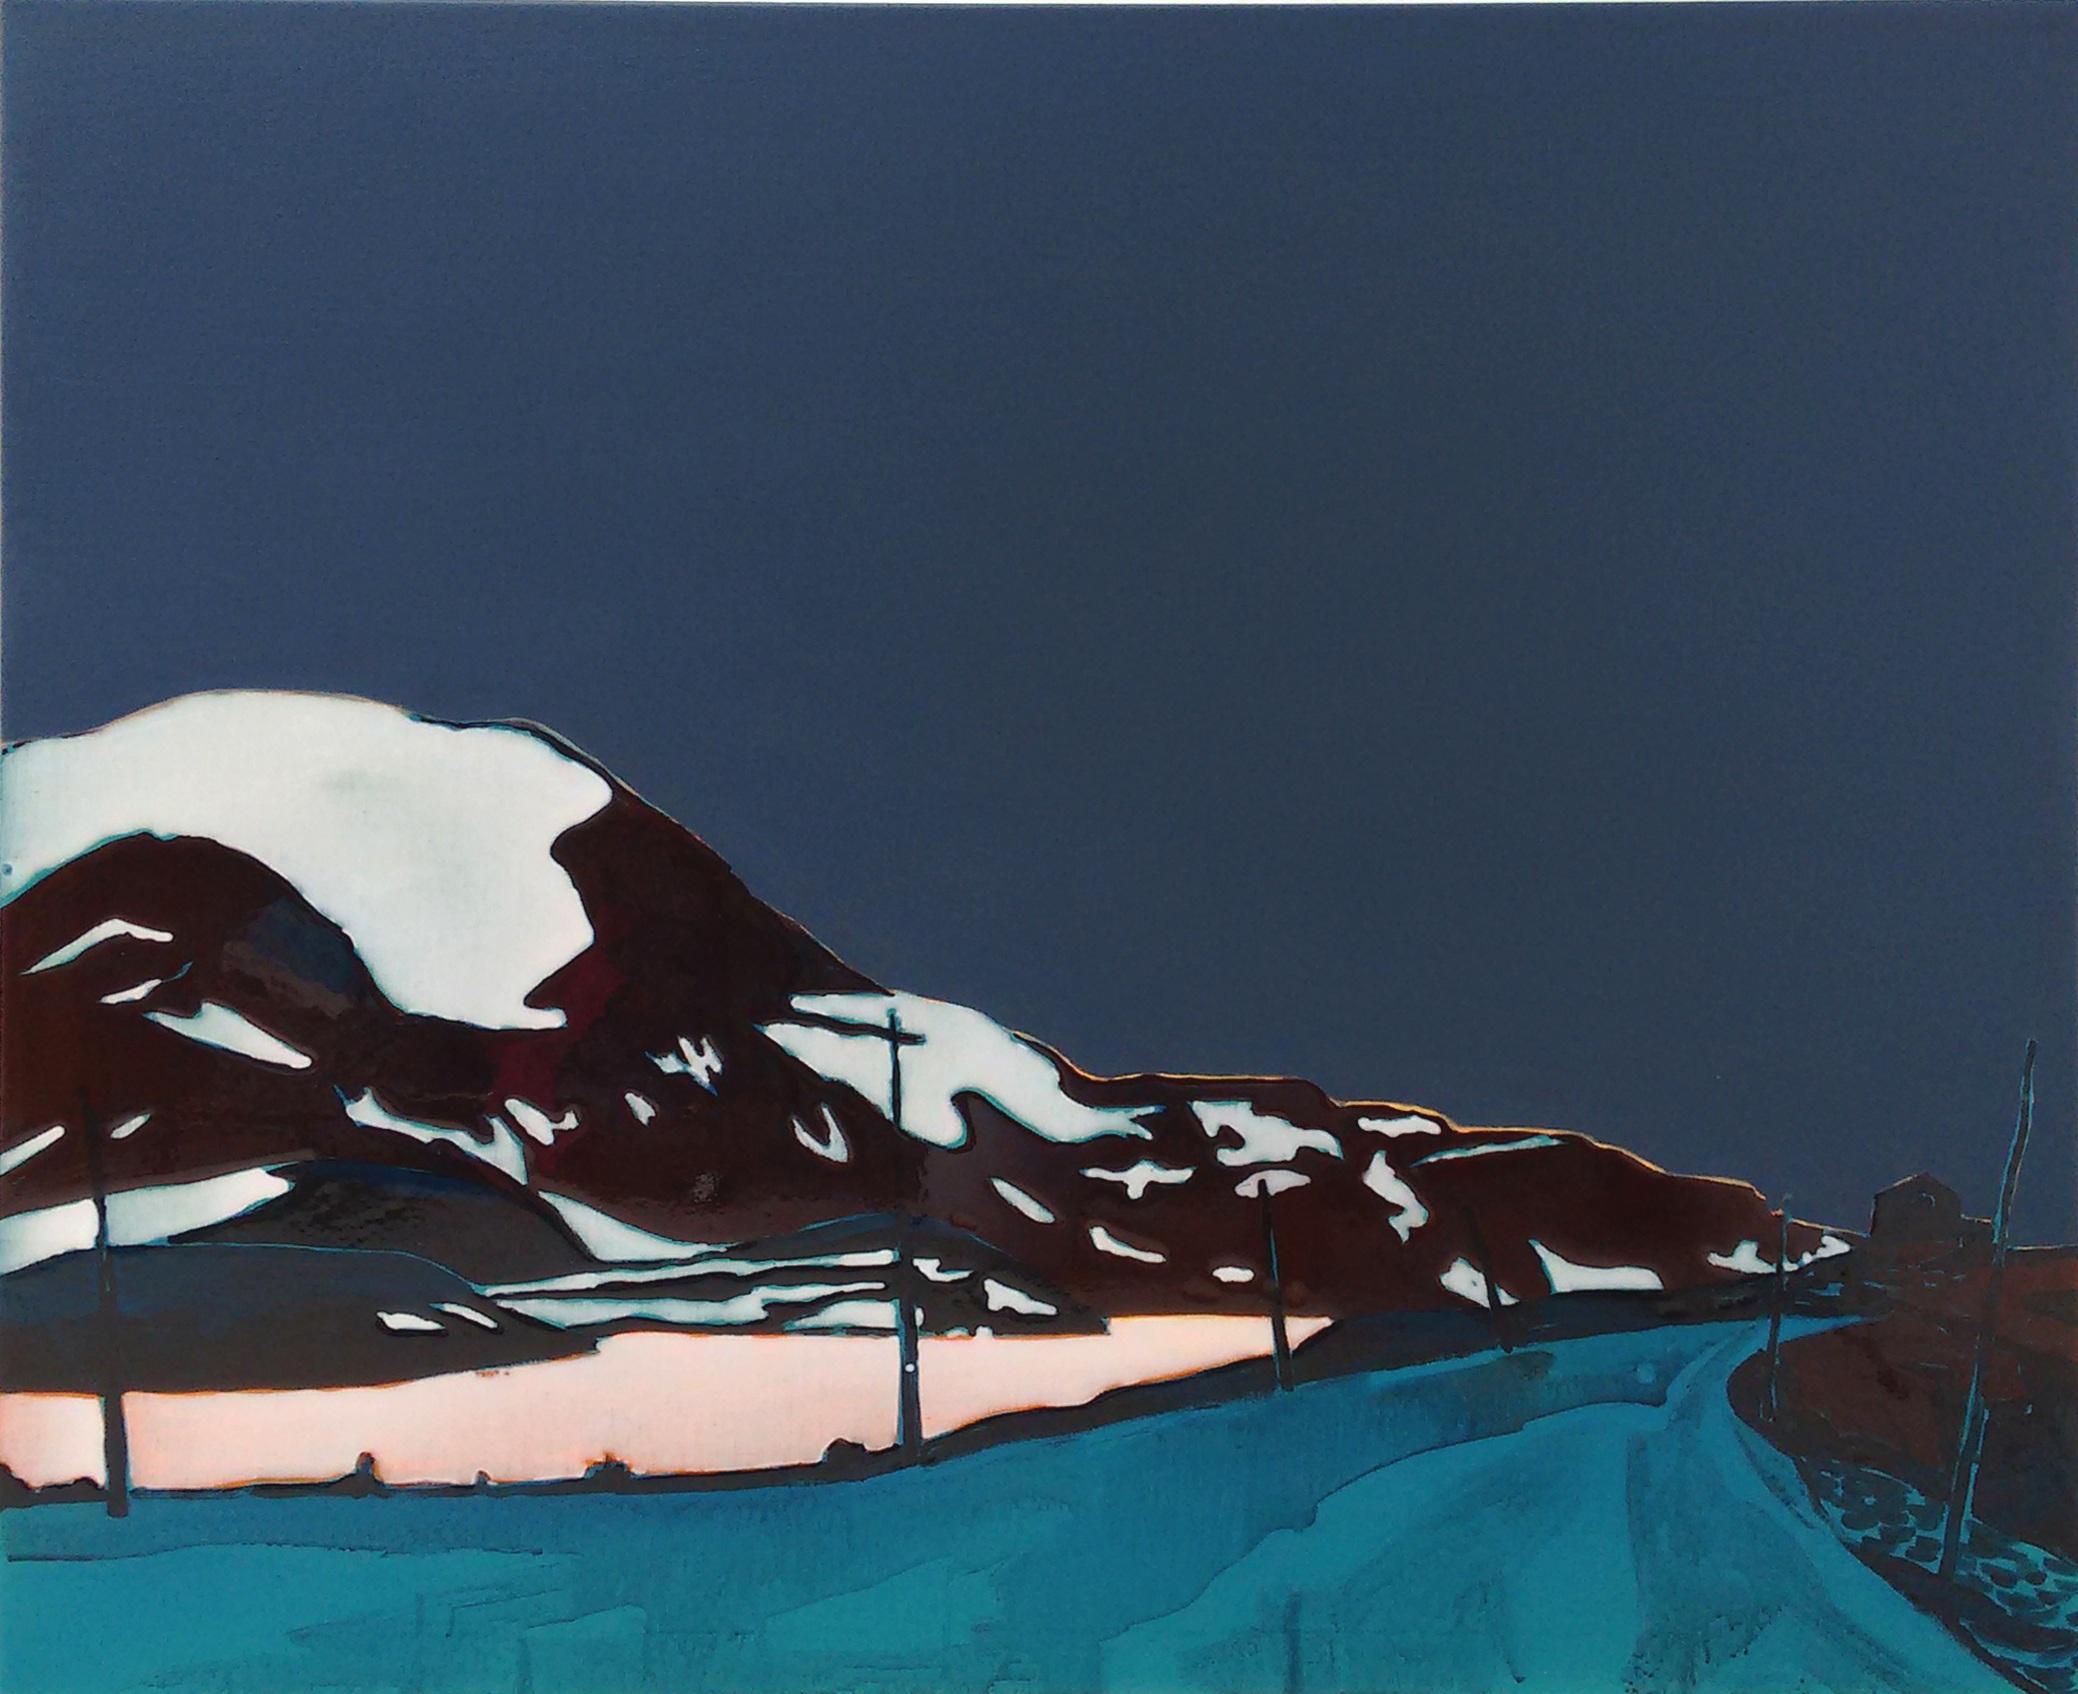 SOGNEFJELLSVEGEN 1  120 x 100 cm acrylic and epoxy on canvas  Sold